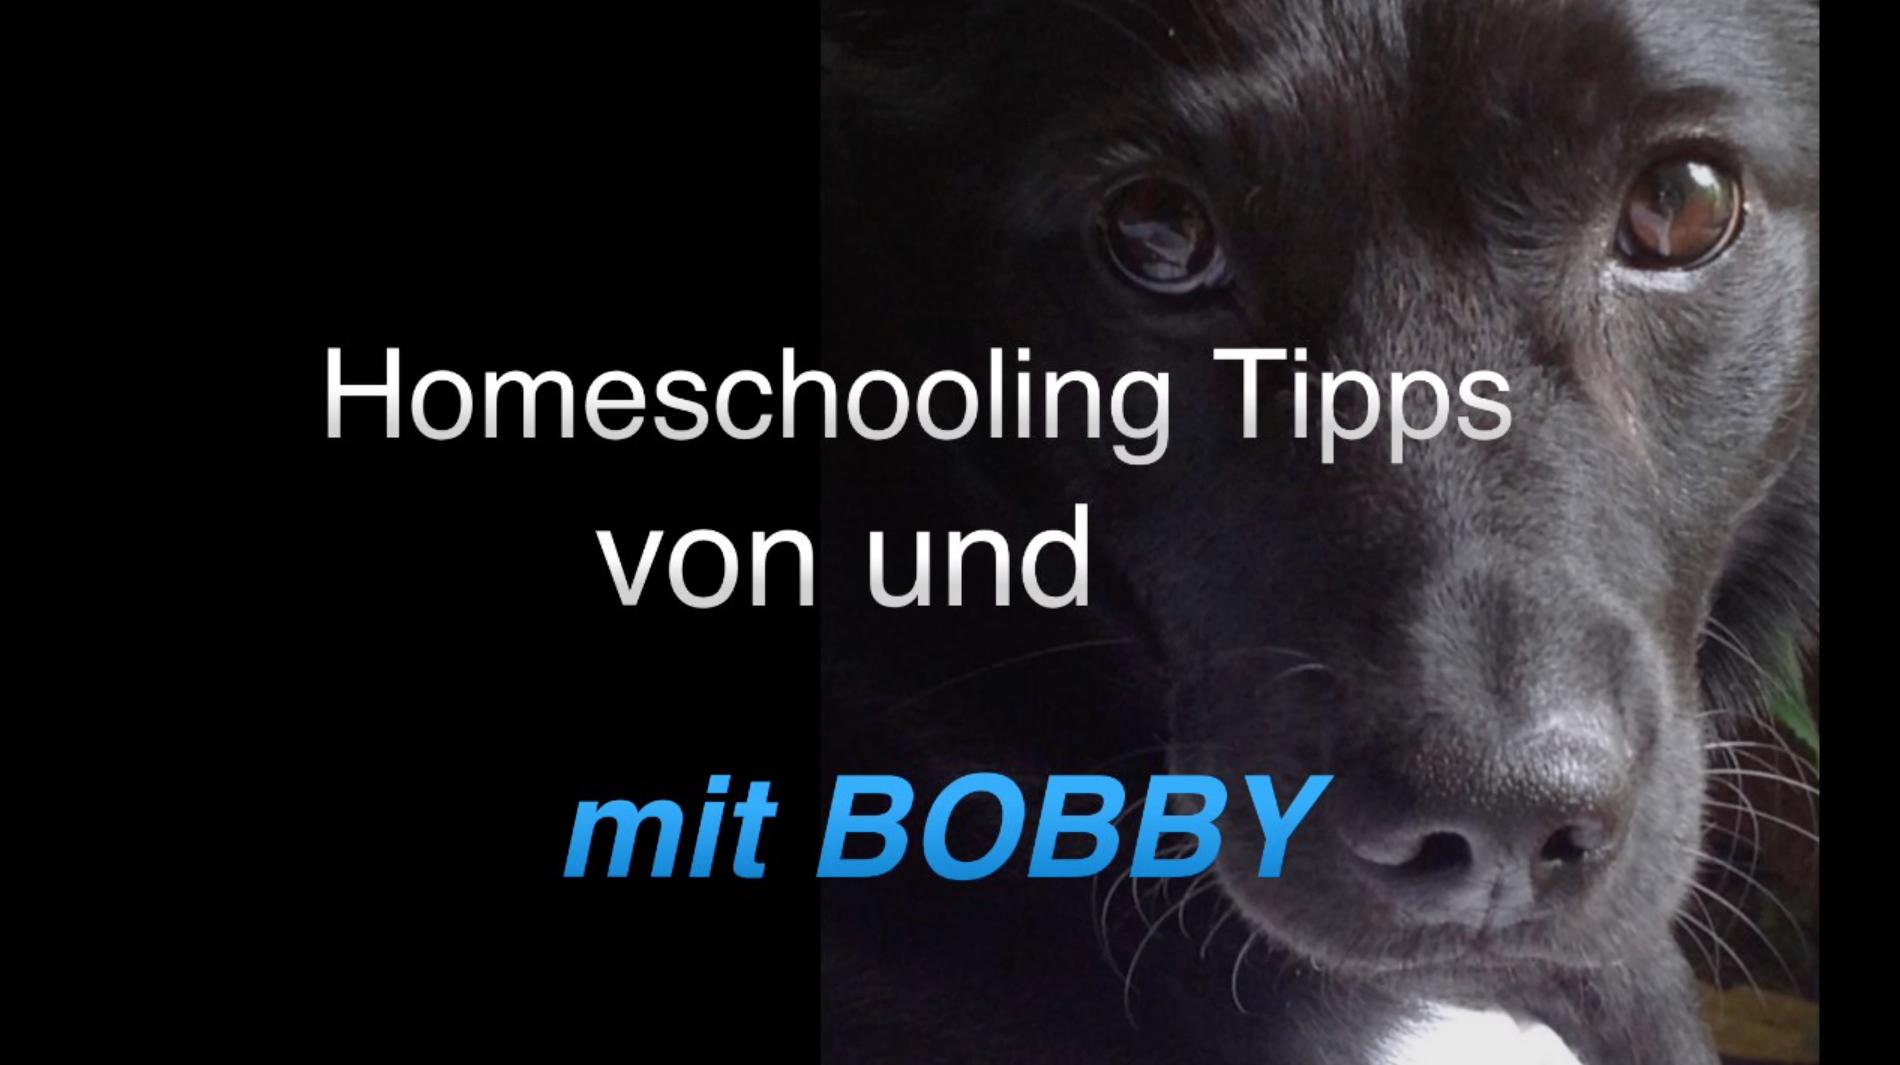 Bobby gibt wertvolle Tipps zum Homeschooling!